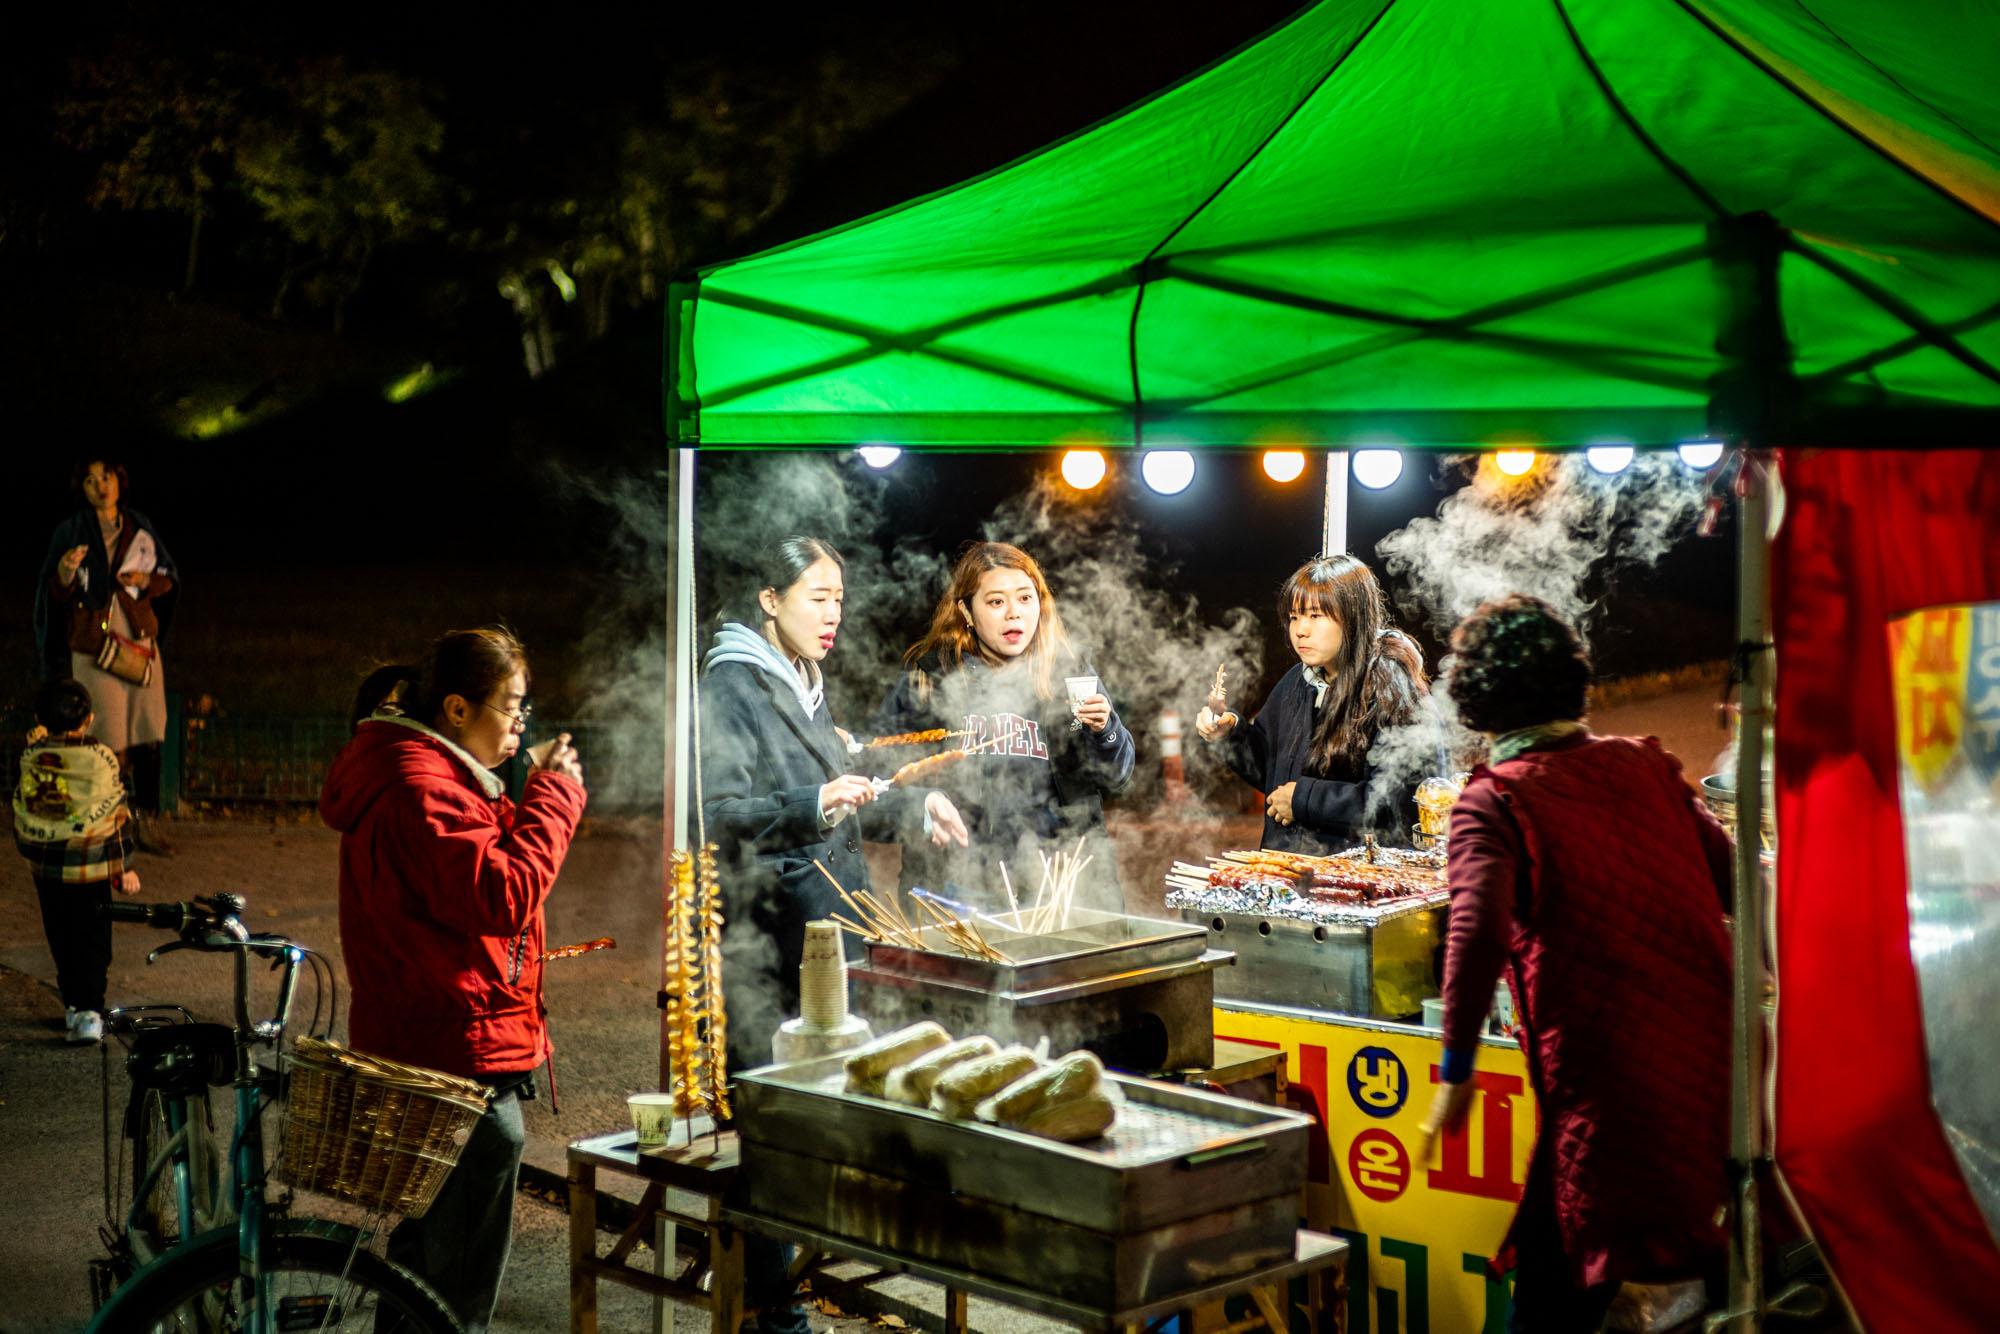 gyeongju-day-night-denis-bosnic-28.jpg